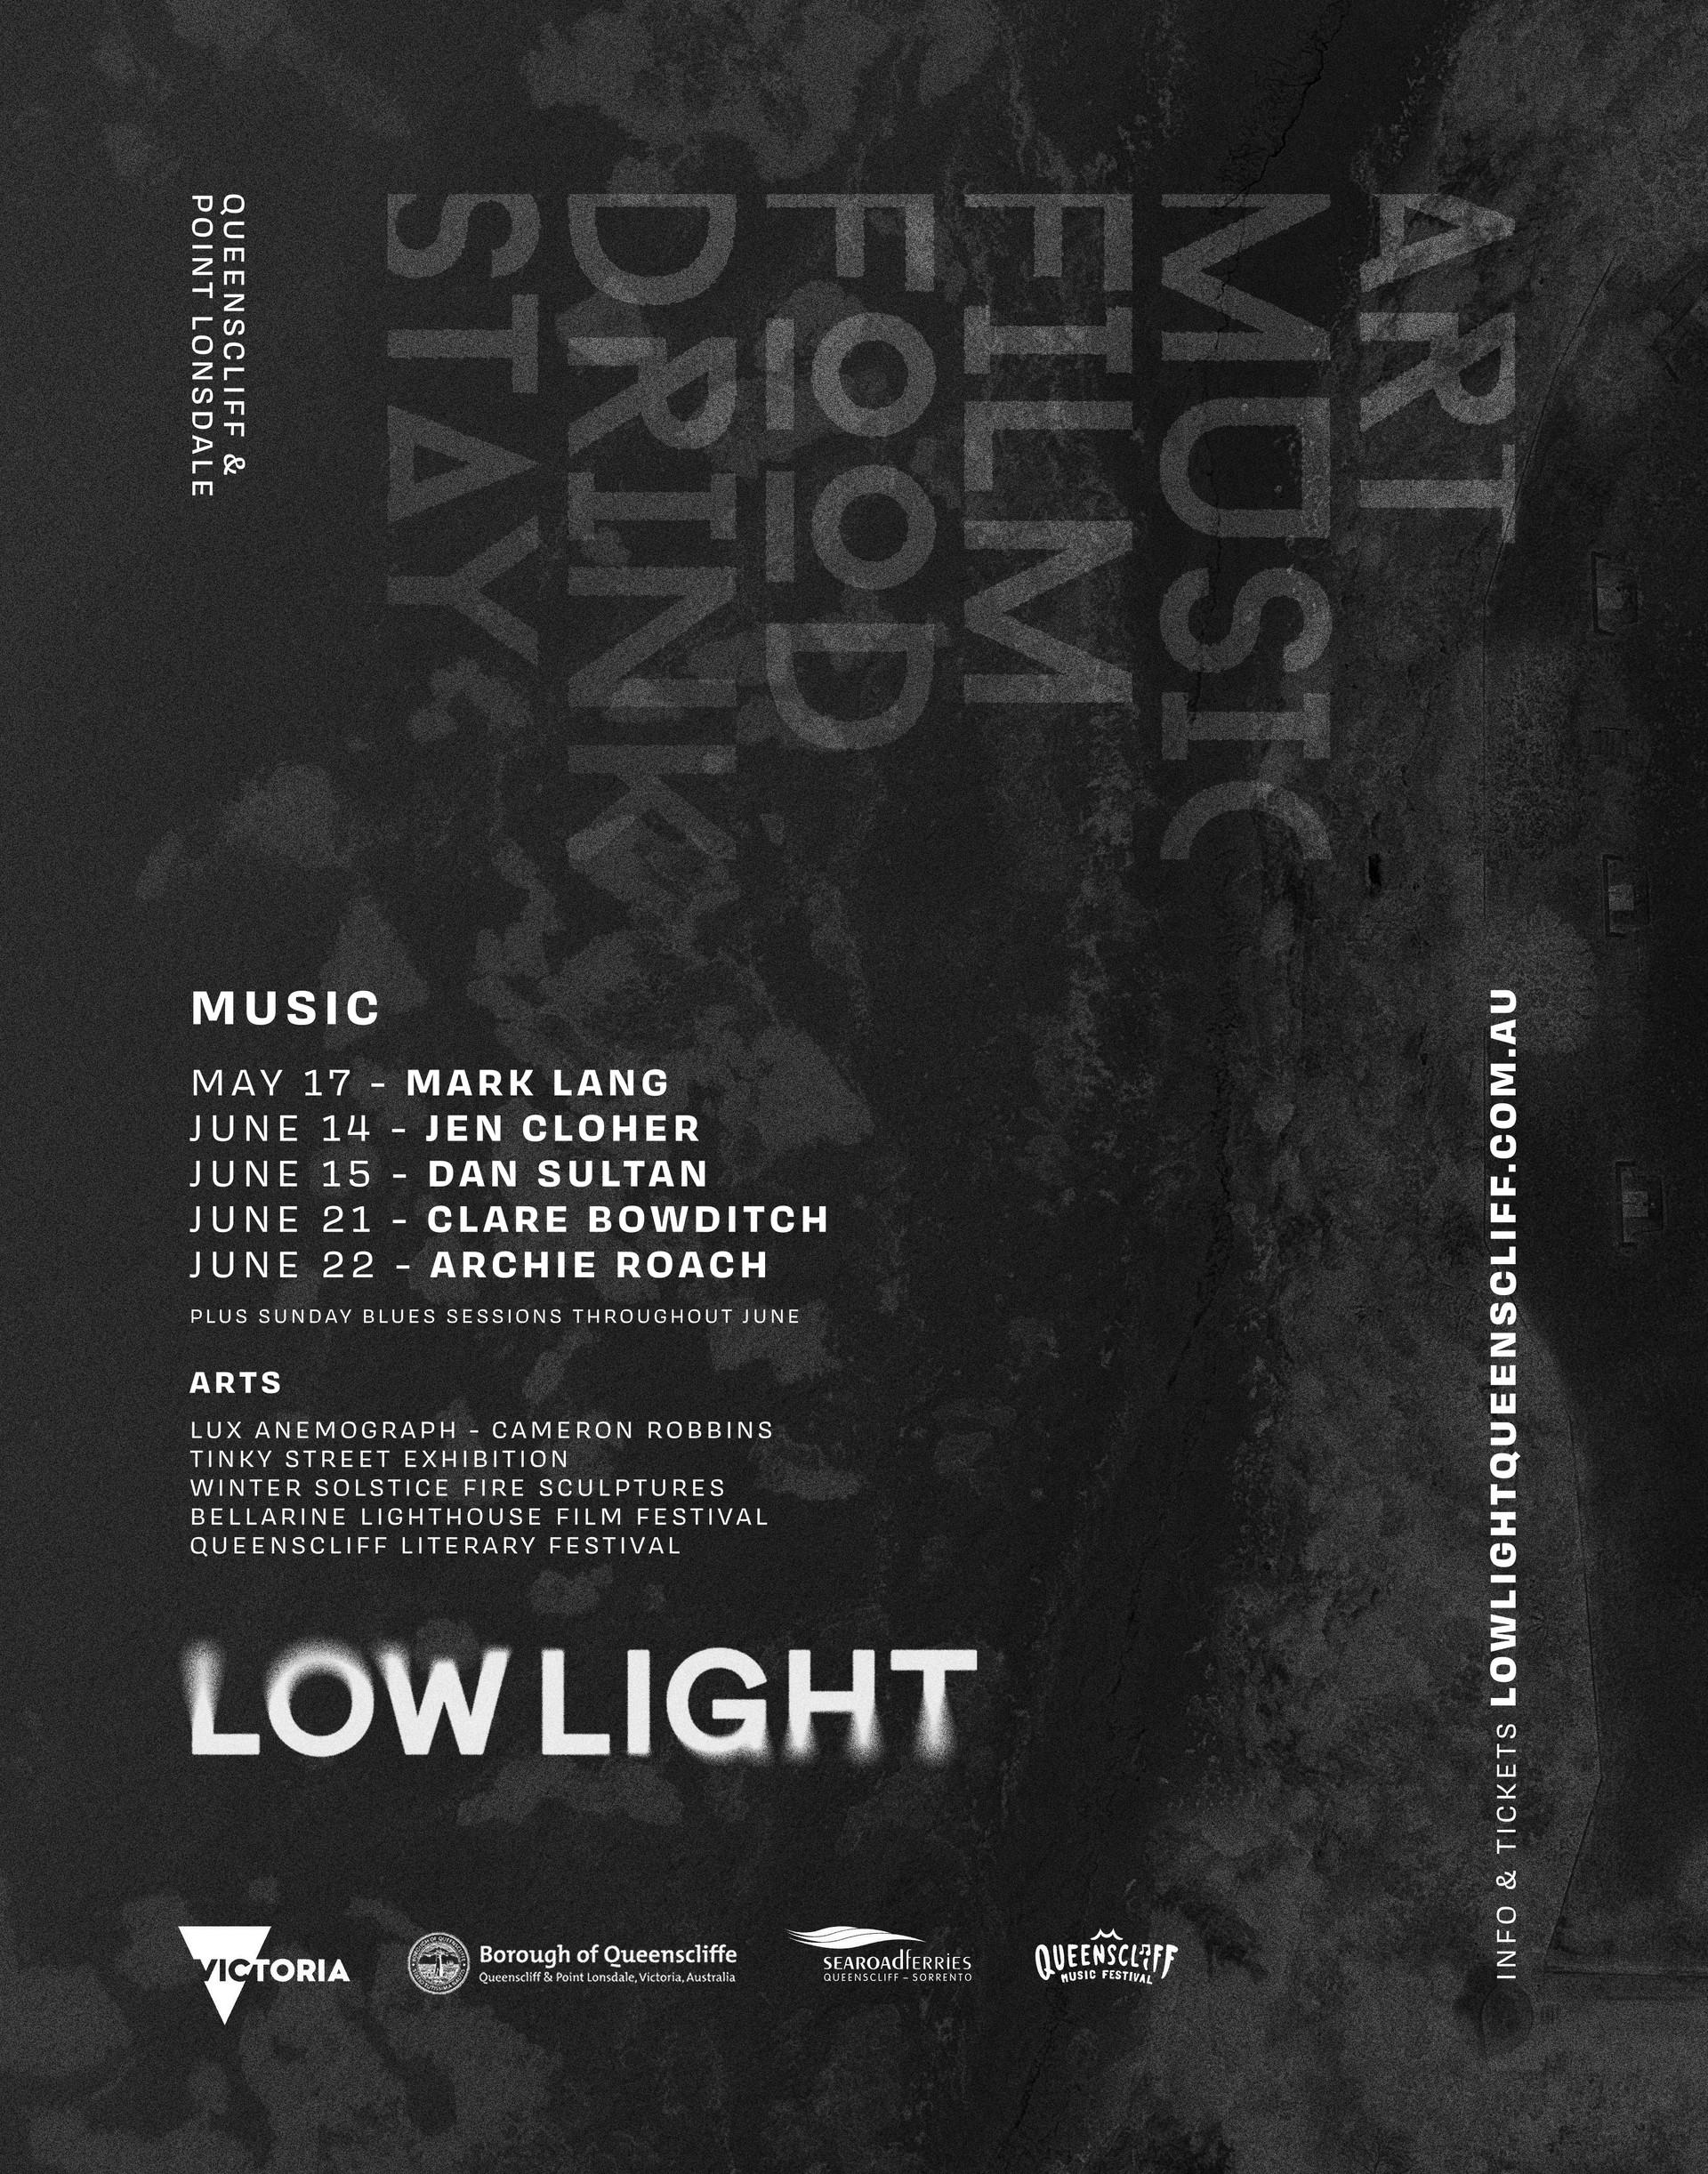 LowLight2019_02.jpg